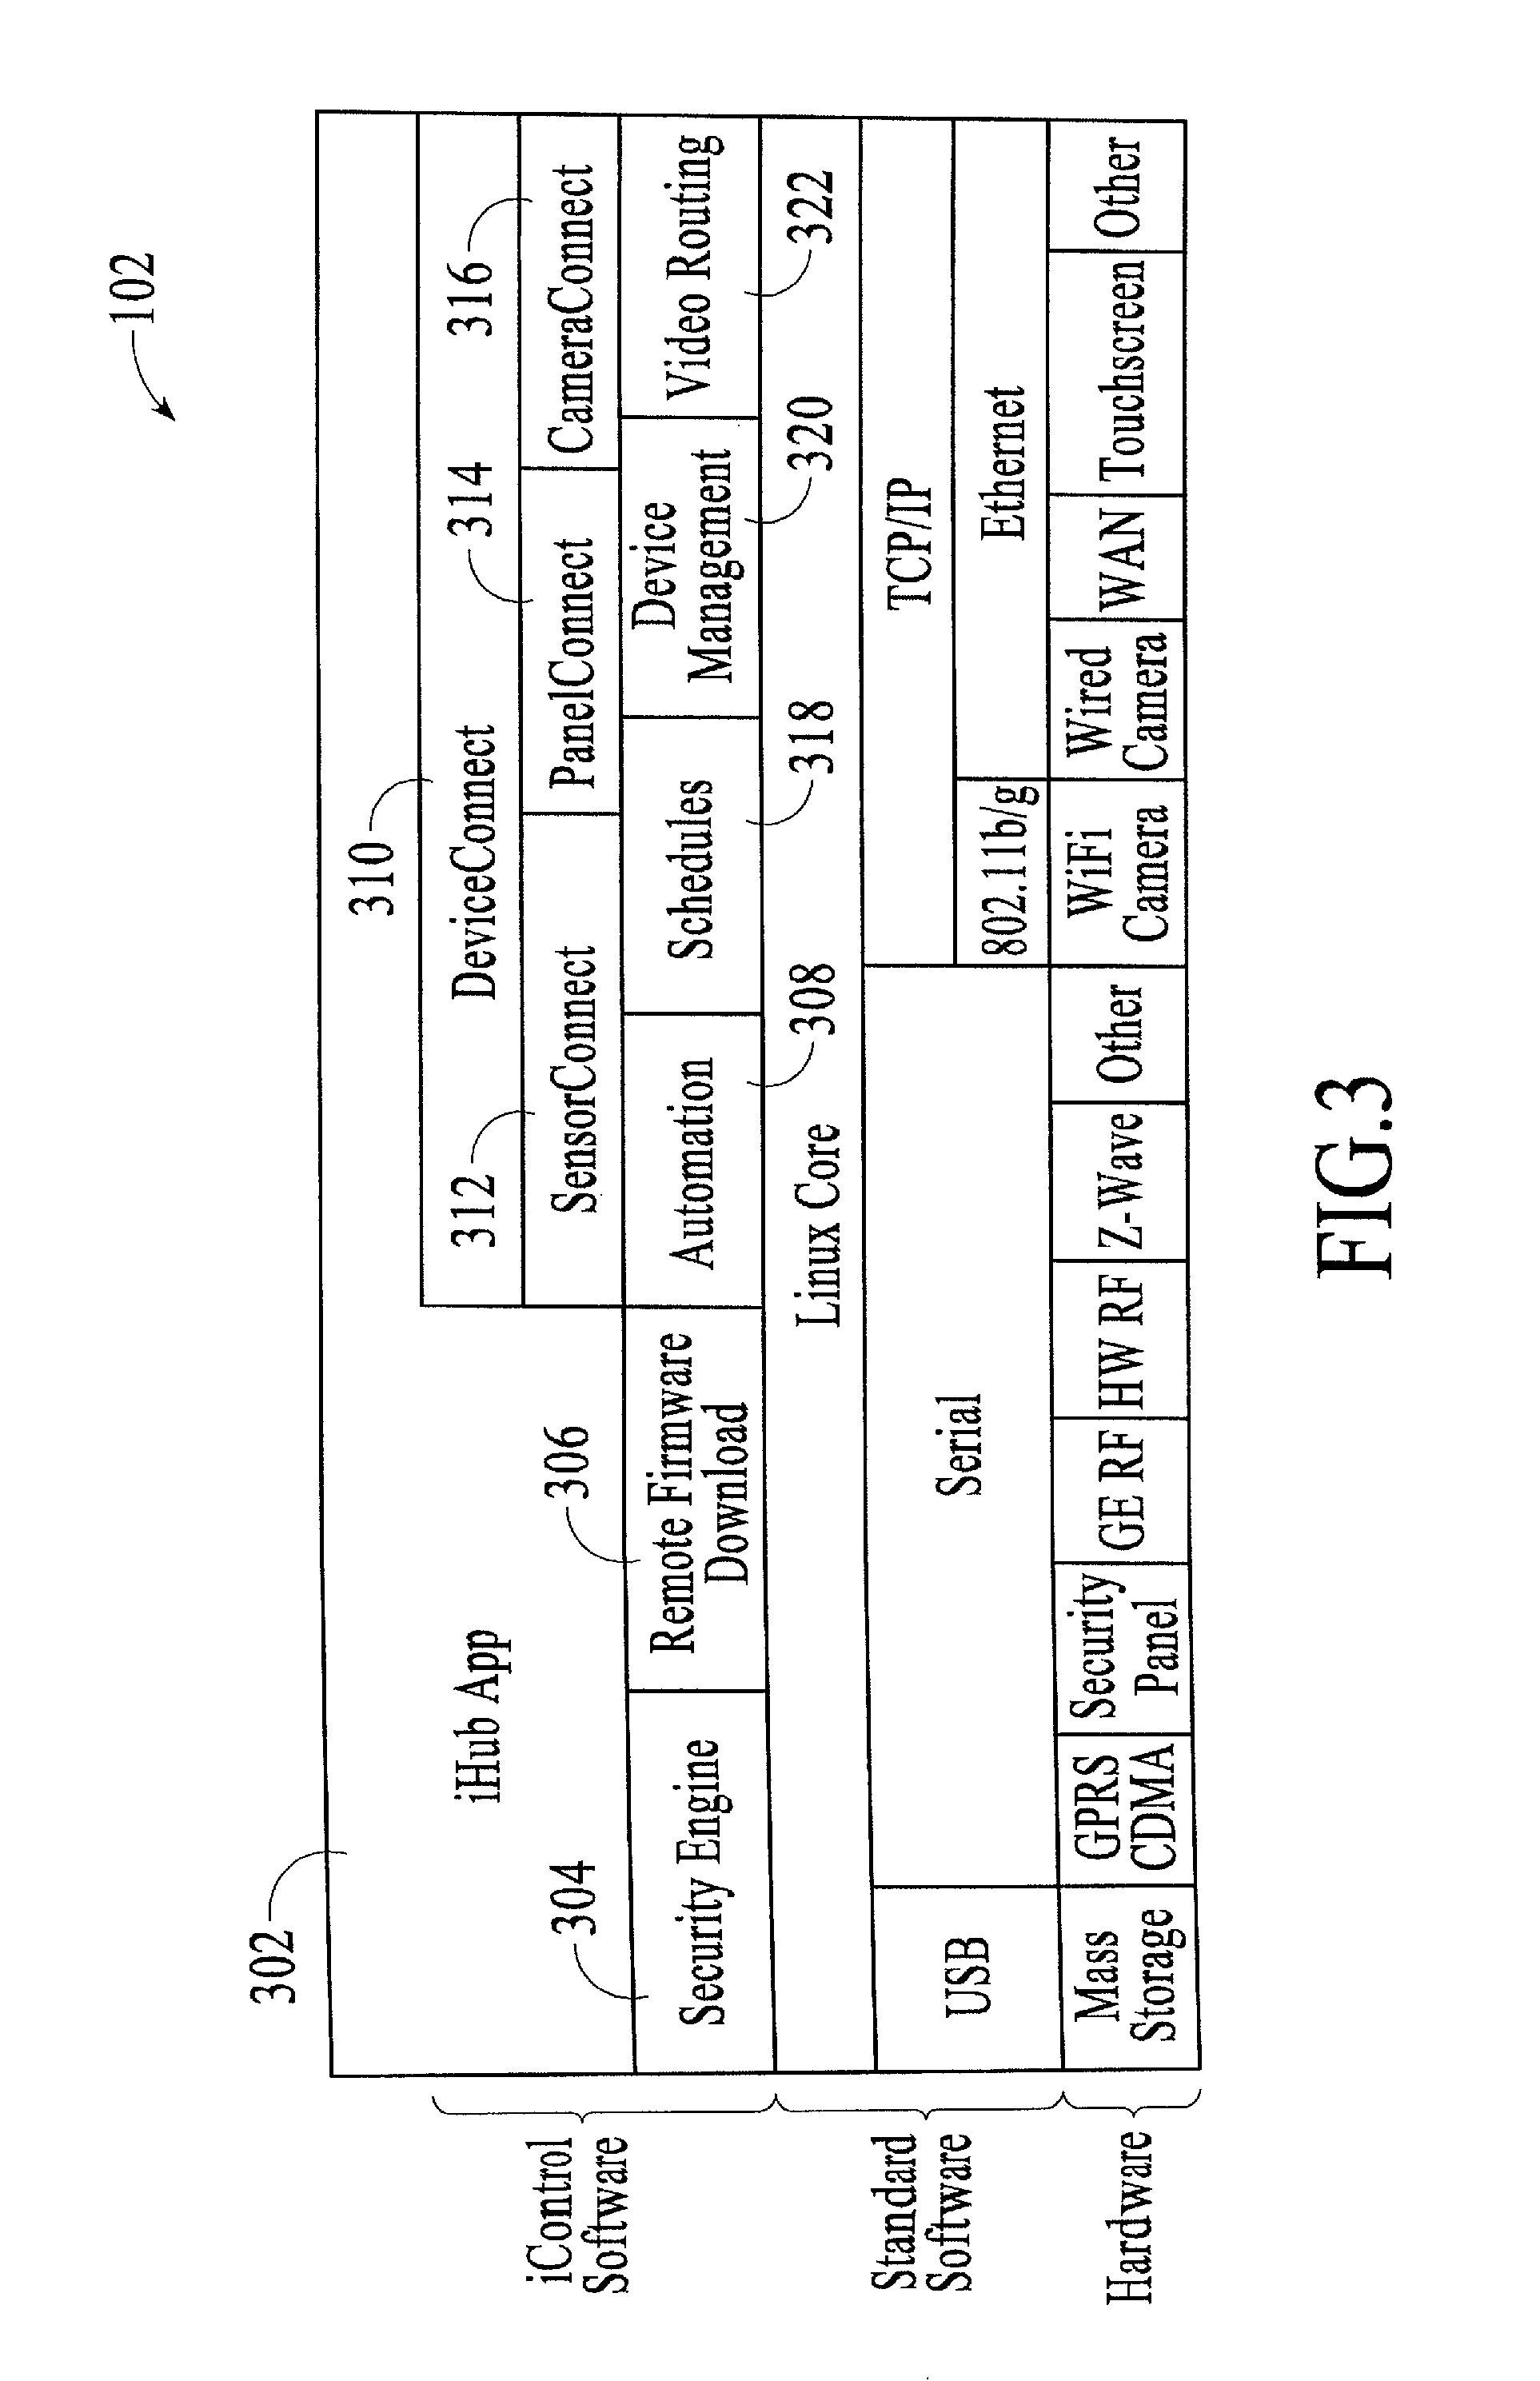 Patent US 10,079,839 B1